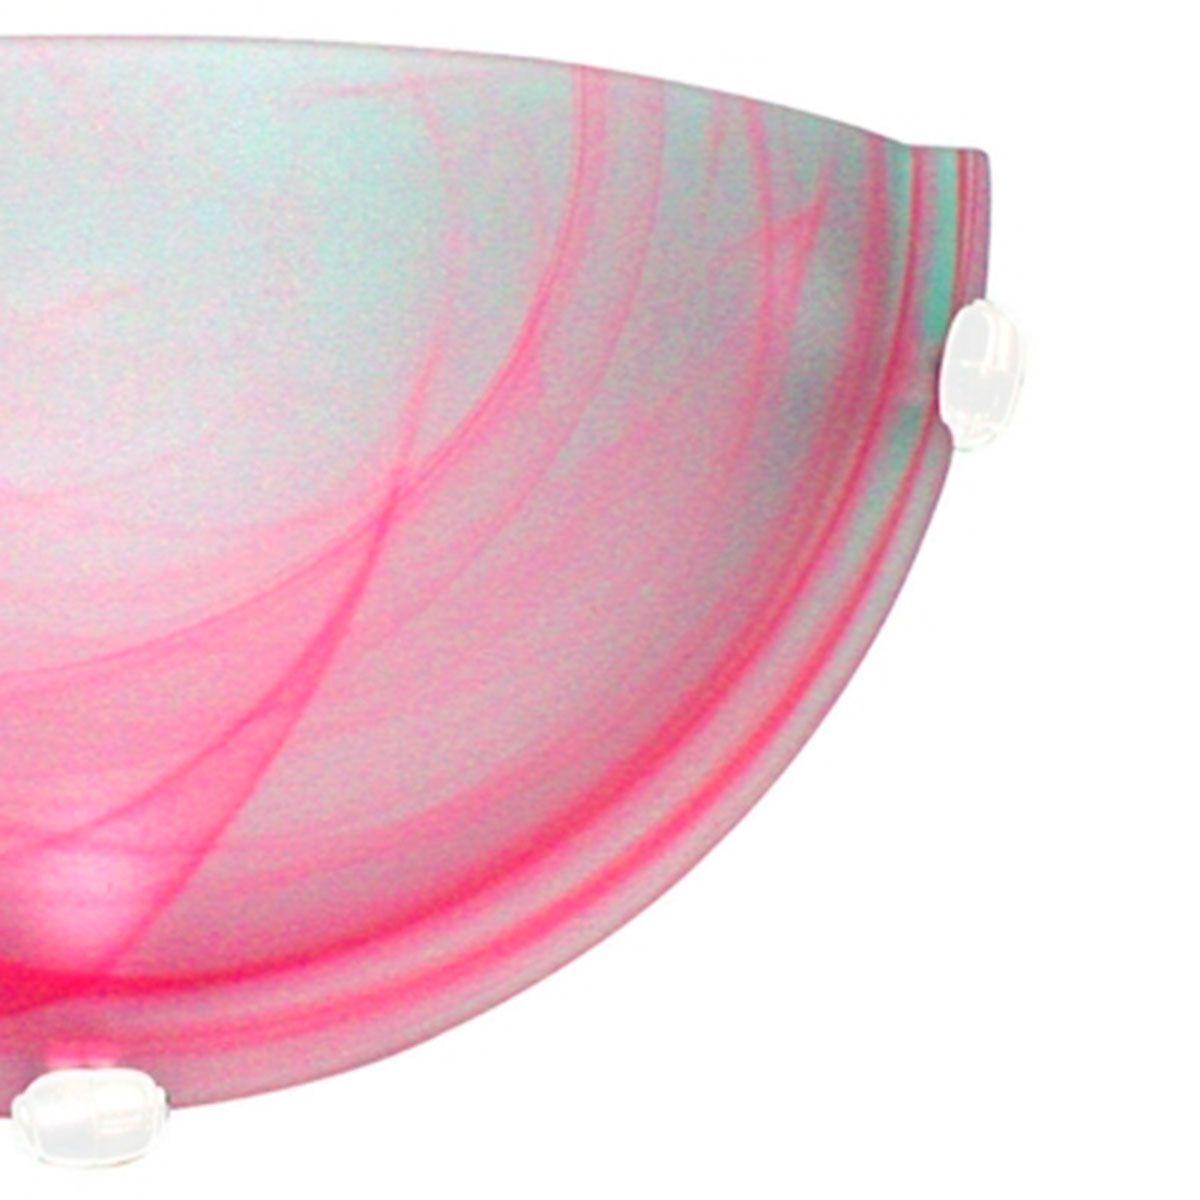 Arandela Murano Vidro 25cm 1 Lampada E-27 Max 60w Rosa Garra Branca 10 Unidades